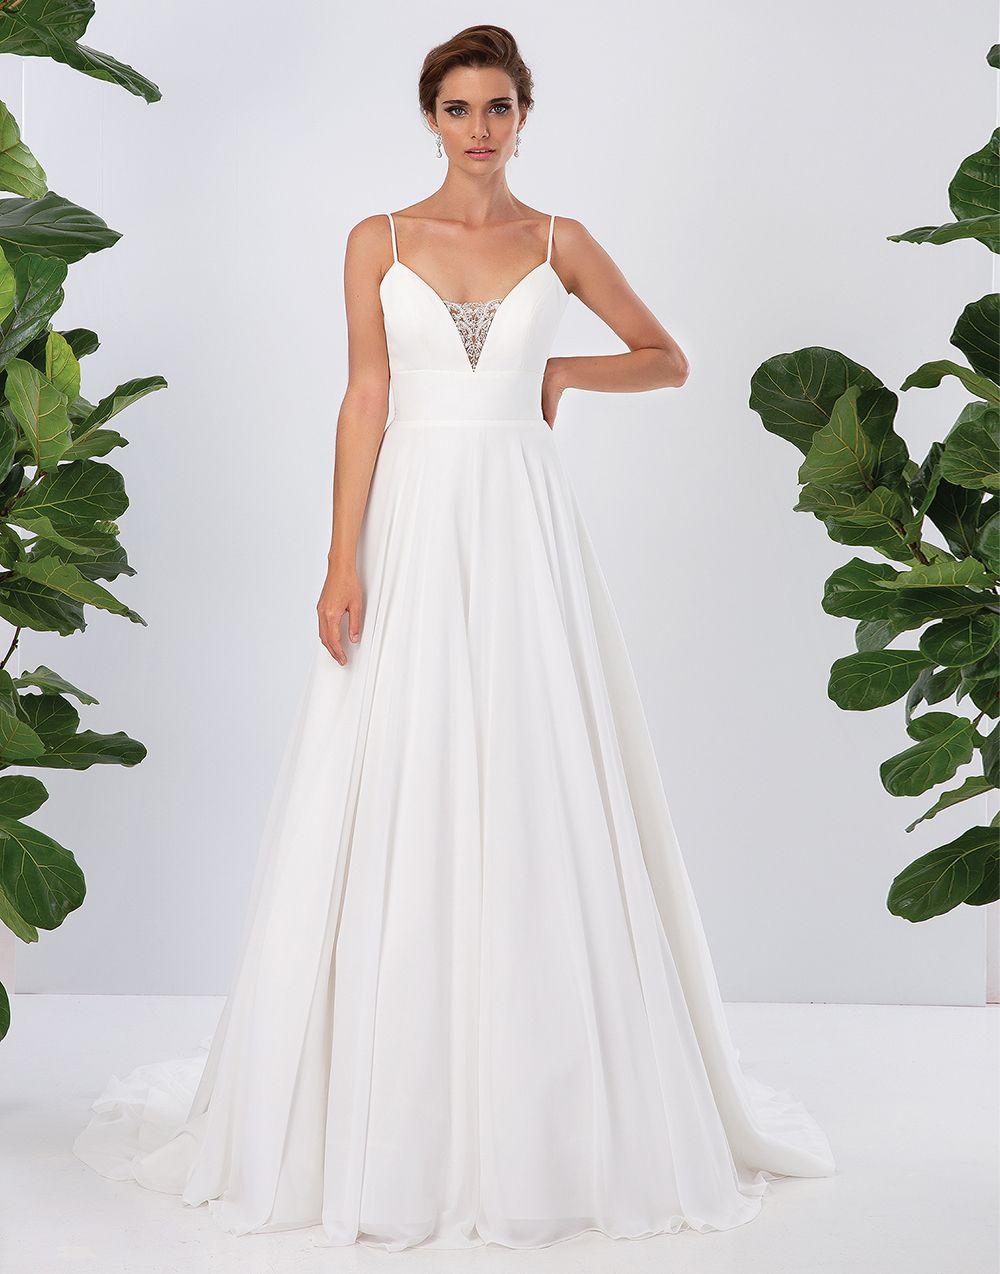 Pin By Brides By Solo Wedding Dress On Lillian West 2020 Collection Plain Wedding Dress Wedding Dresses Satin Popular Wedding Dresses [ 1274 x 1000 Pixel ]